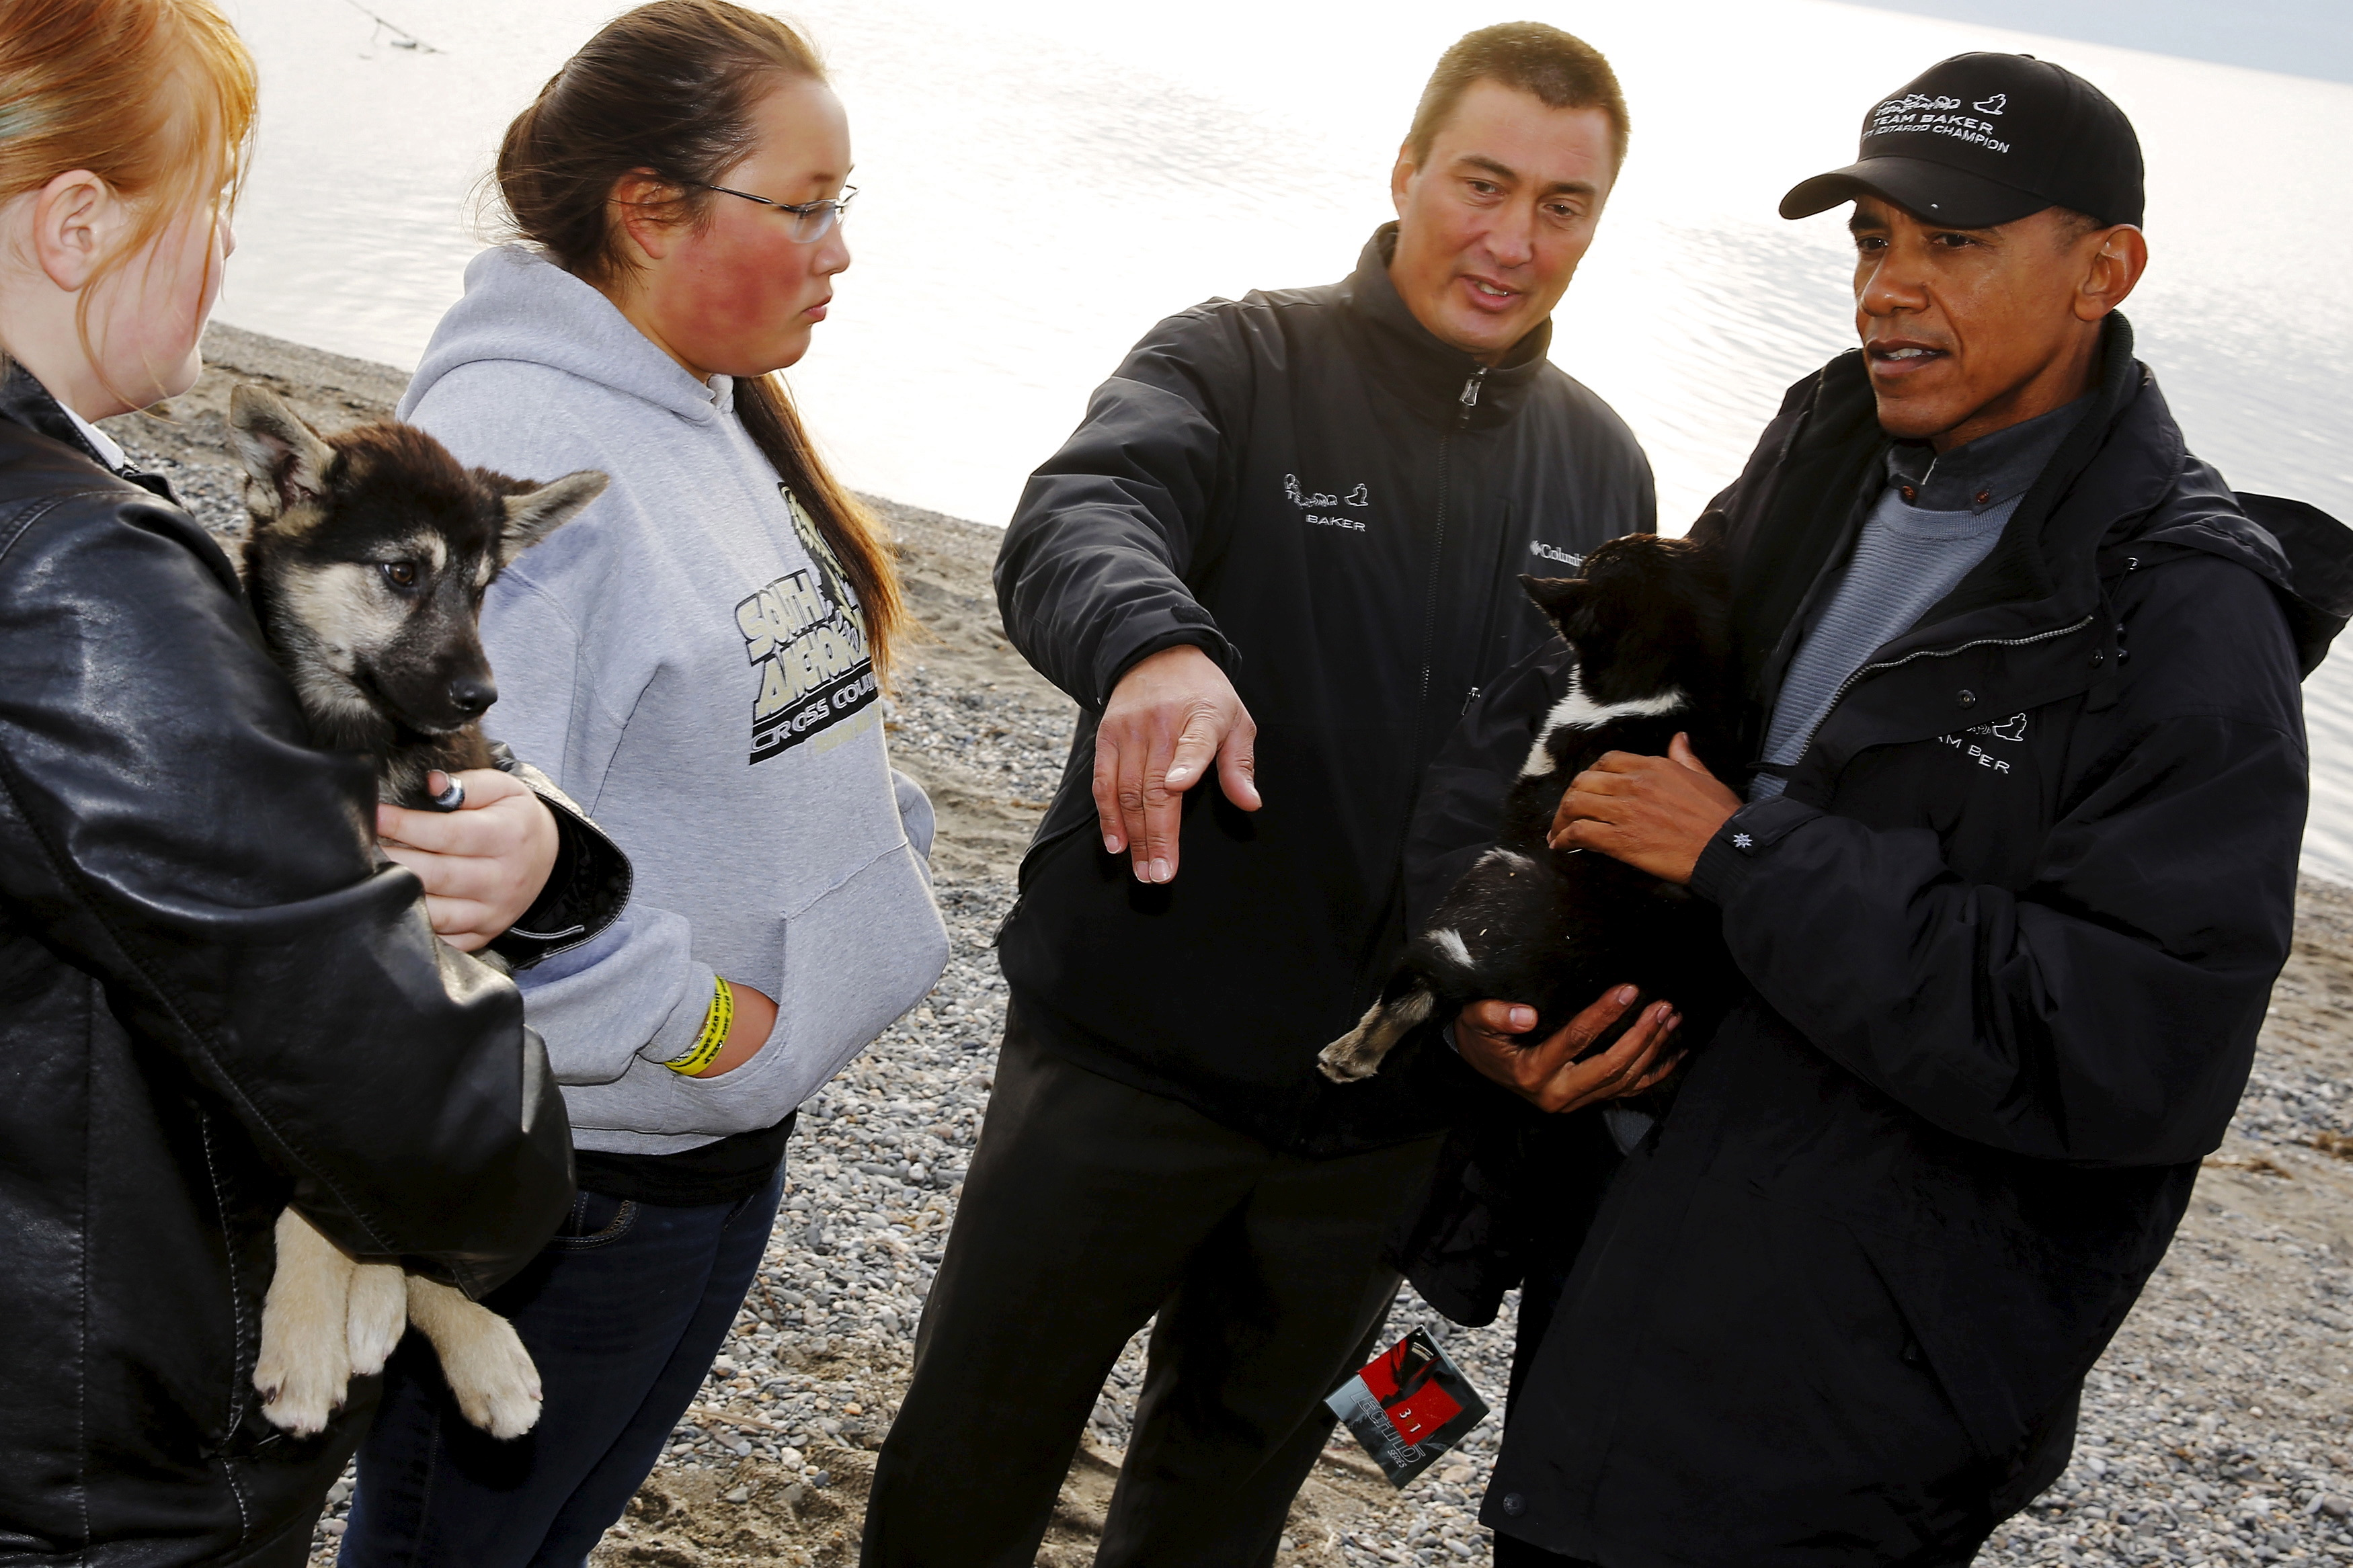 U.S. President Barack Obama (R) looks at dog sled puppies belonging to 2011 Iditarod Dog Sled Race champion John Baker in Kotzebue, Alaska on Sept. 2, 2015.